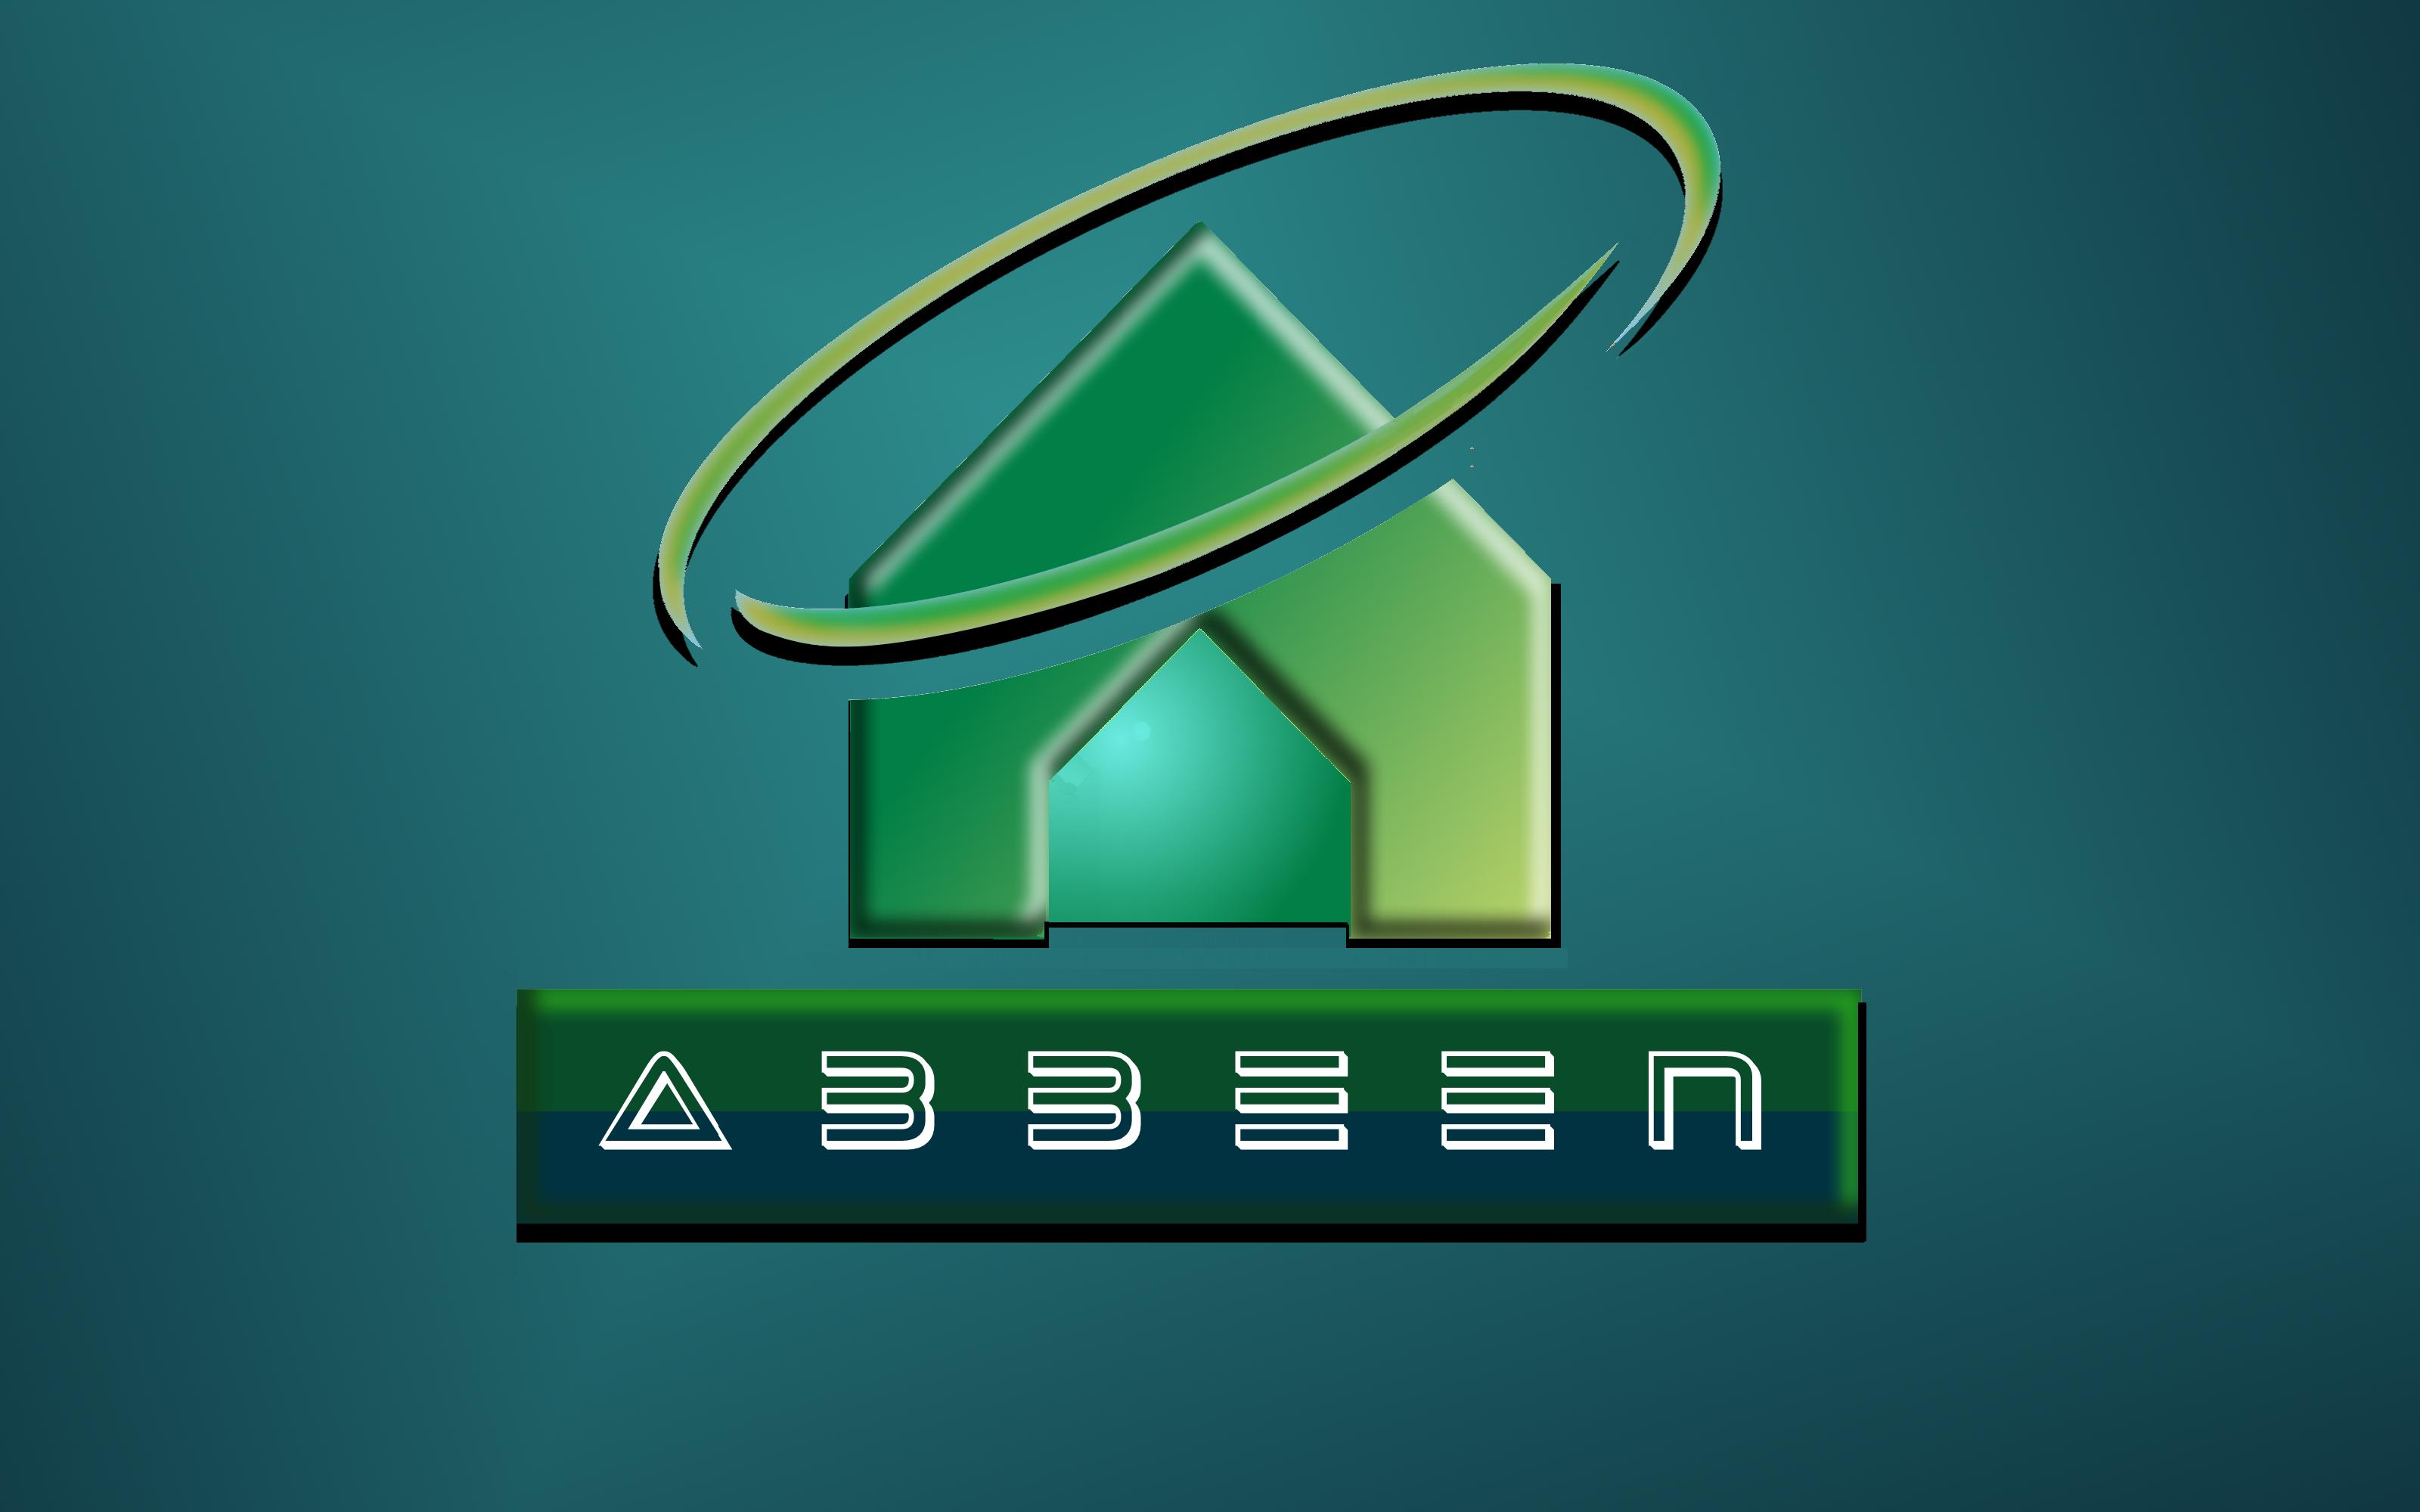 Logo Design by Roberto Bassi - Entry No. 220 in the Logo Design Contest Luxury Logo Design for Abbeem.